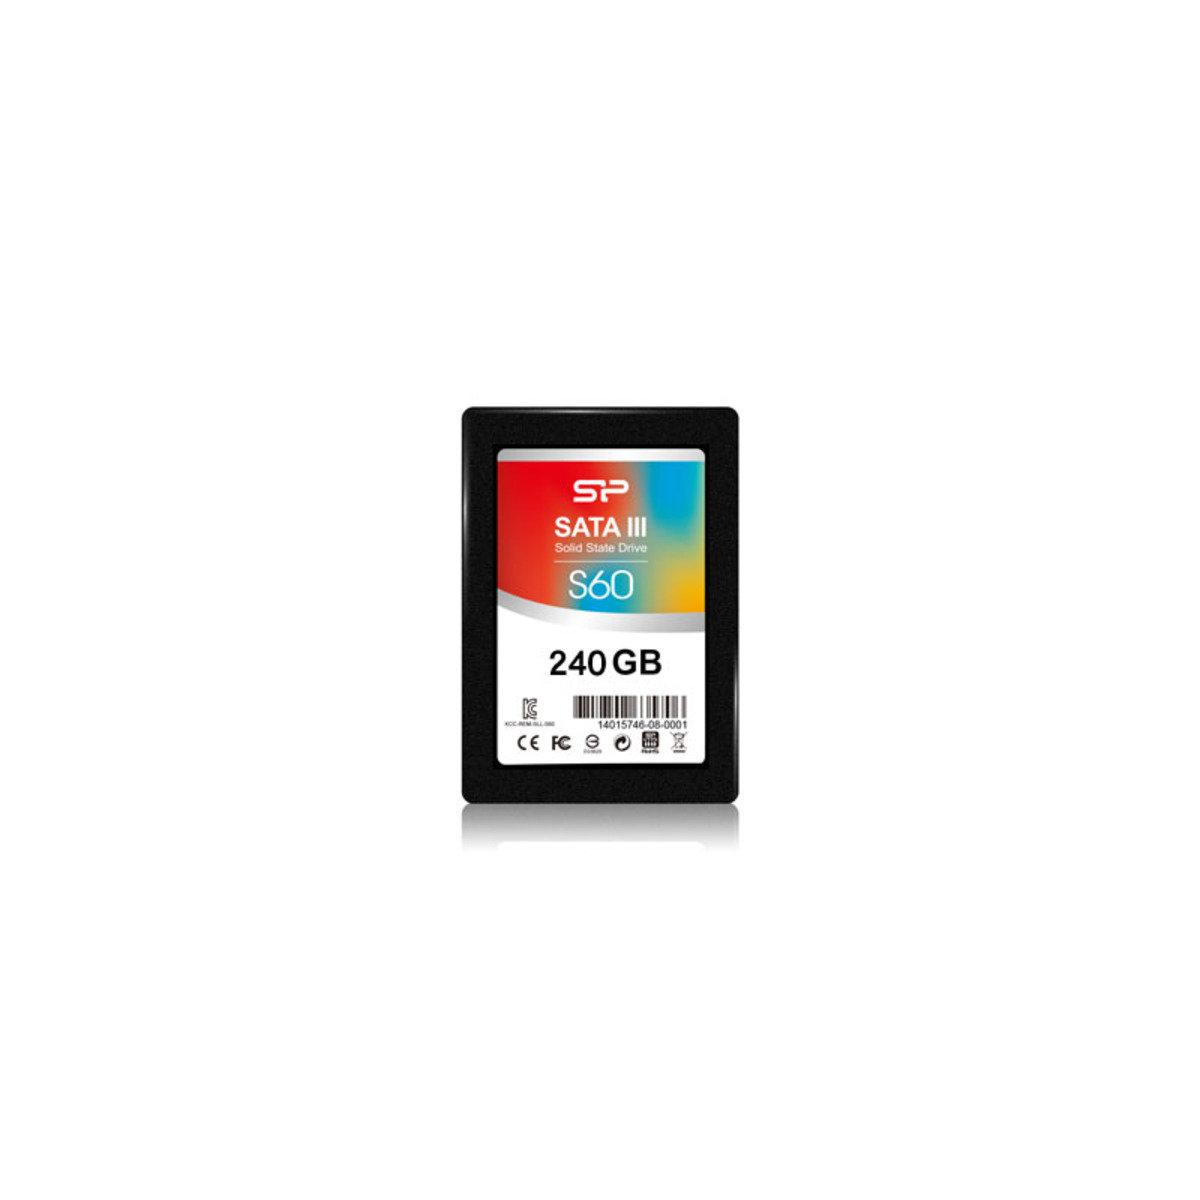 SSD 高速內置固體硬碟 240GB SP240GBSS3S60S25